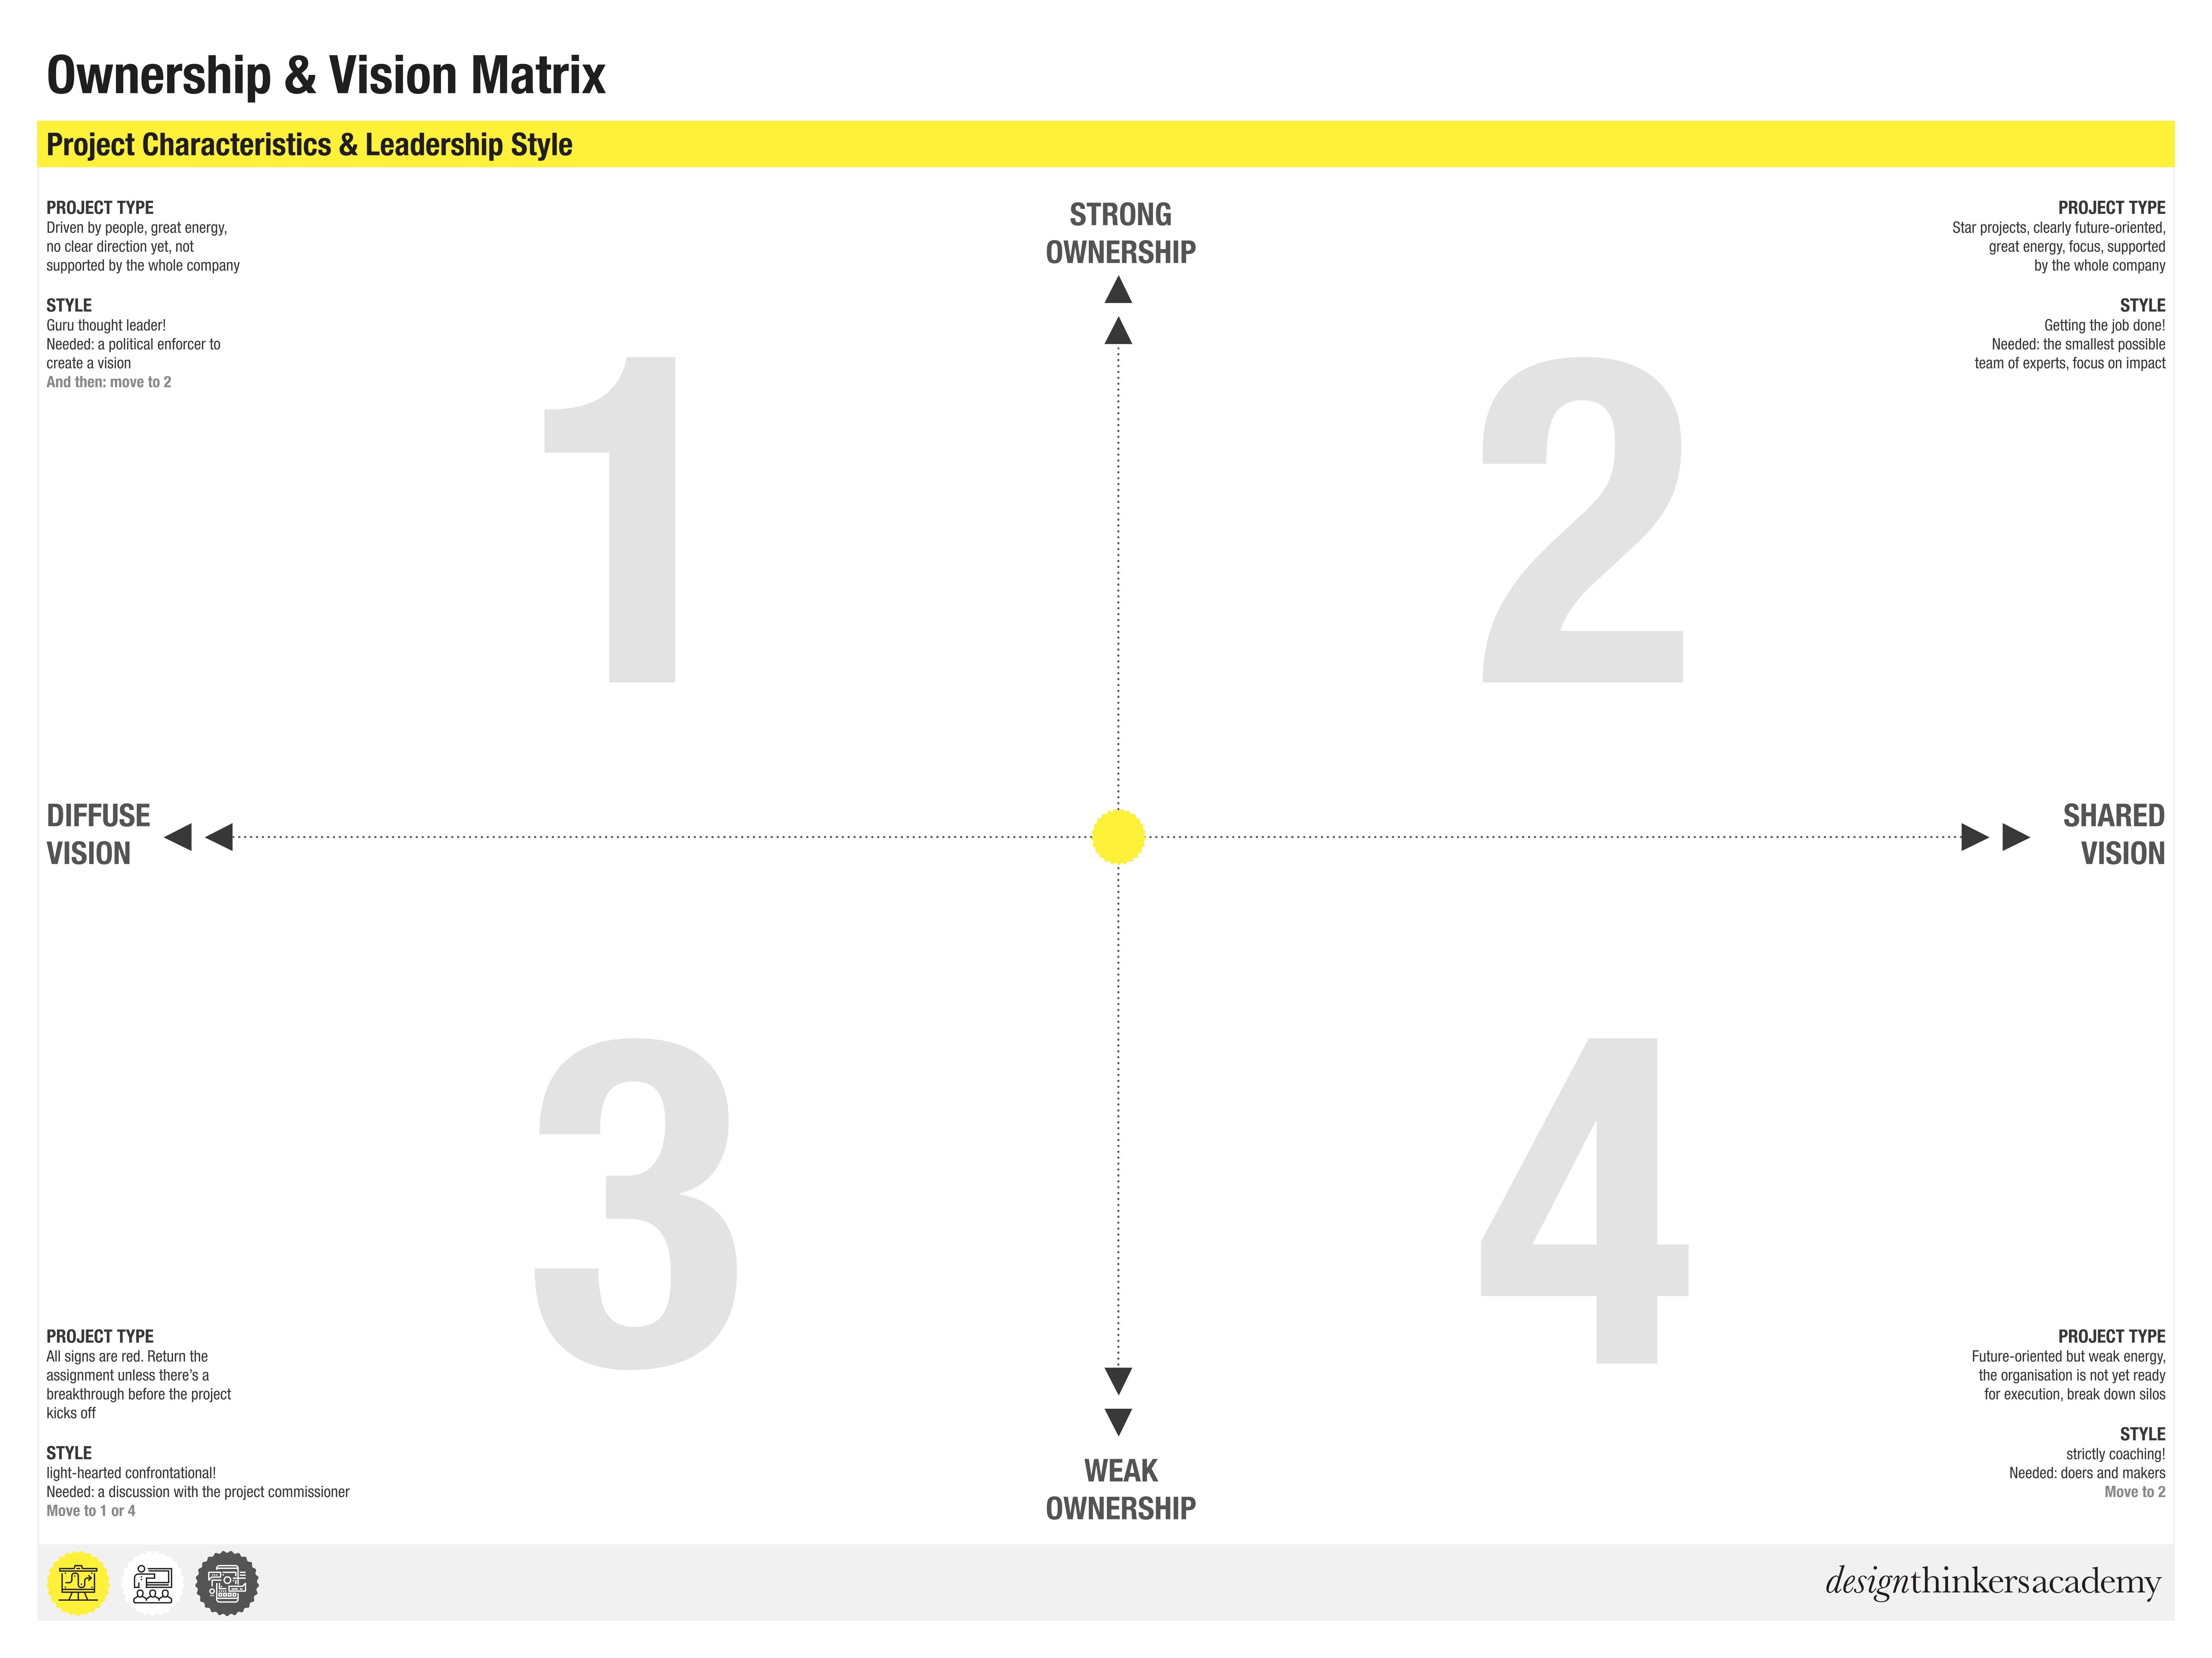 Dta Tool Ownership Vision Matrix Design Thinking Tools Design Thinking Workshop Design Thinking Process